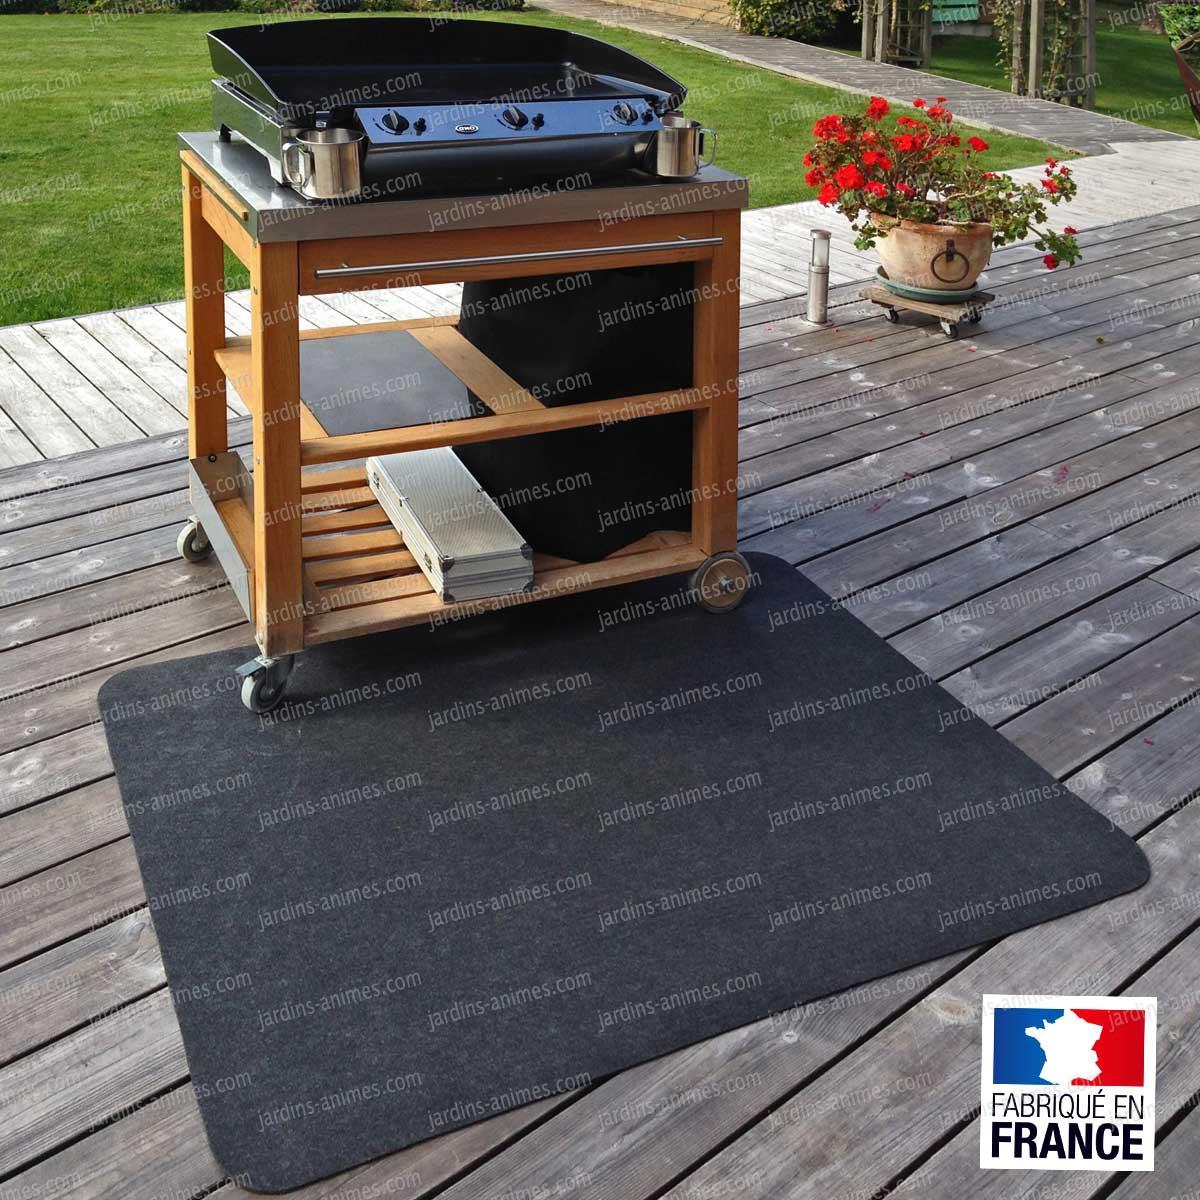 tapis de protection de sols pour plancha bras ro plancha barbecue. Black Bedroom Furniture Sets. Home Design Ideas